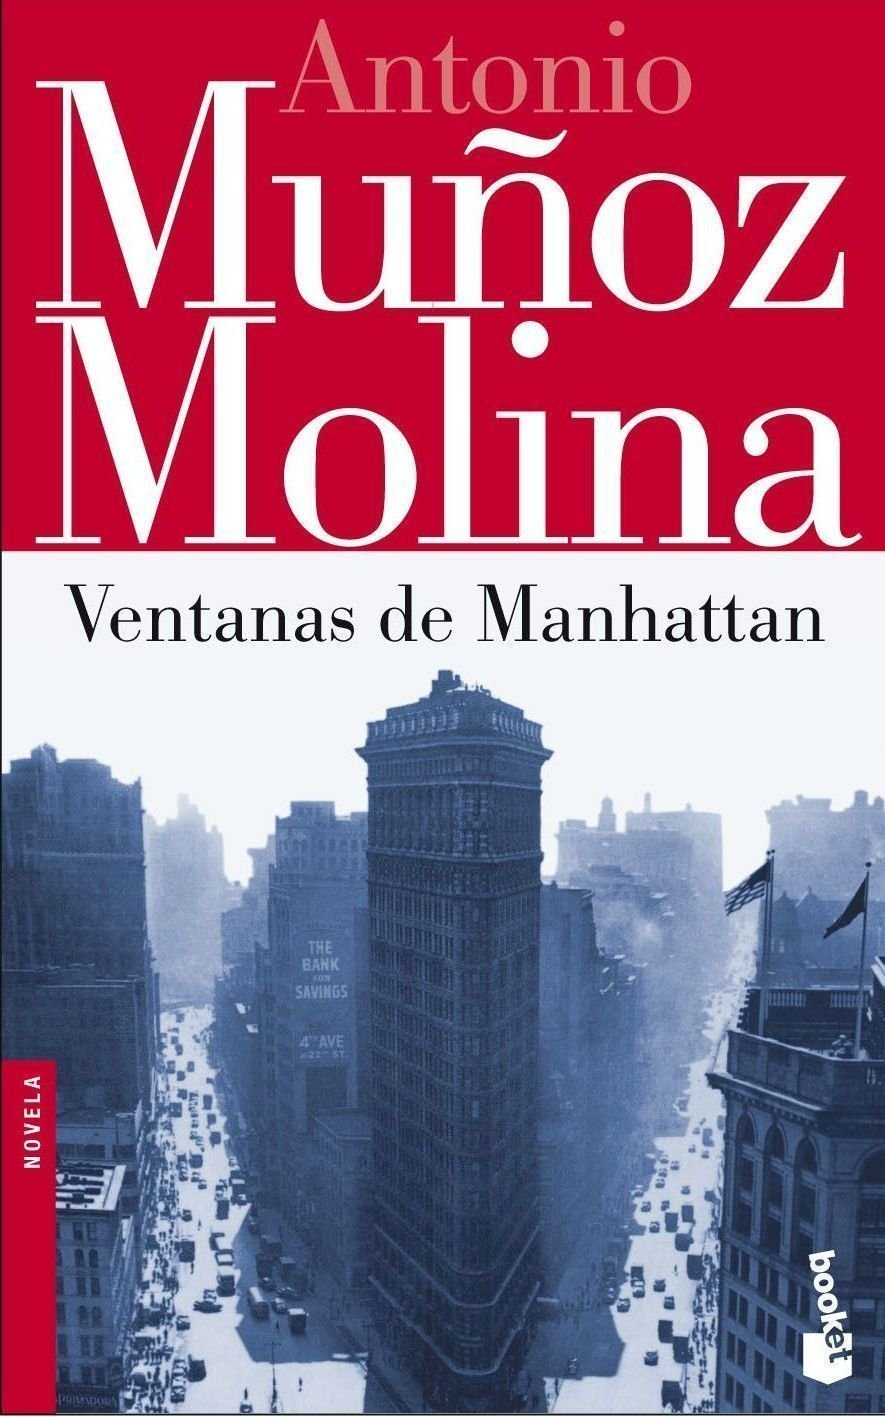 Ventanas de Manhattan Biblioteca Antonio Muñoz Molina: Amazon.es: Muñoz Molina, Antonio: Libros